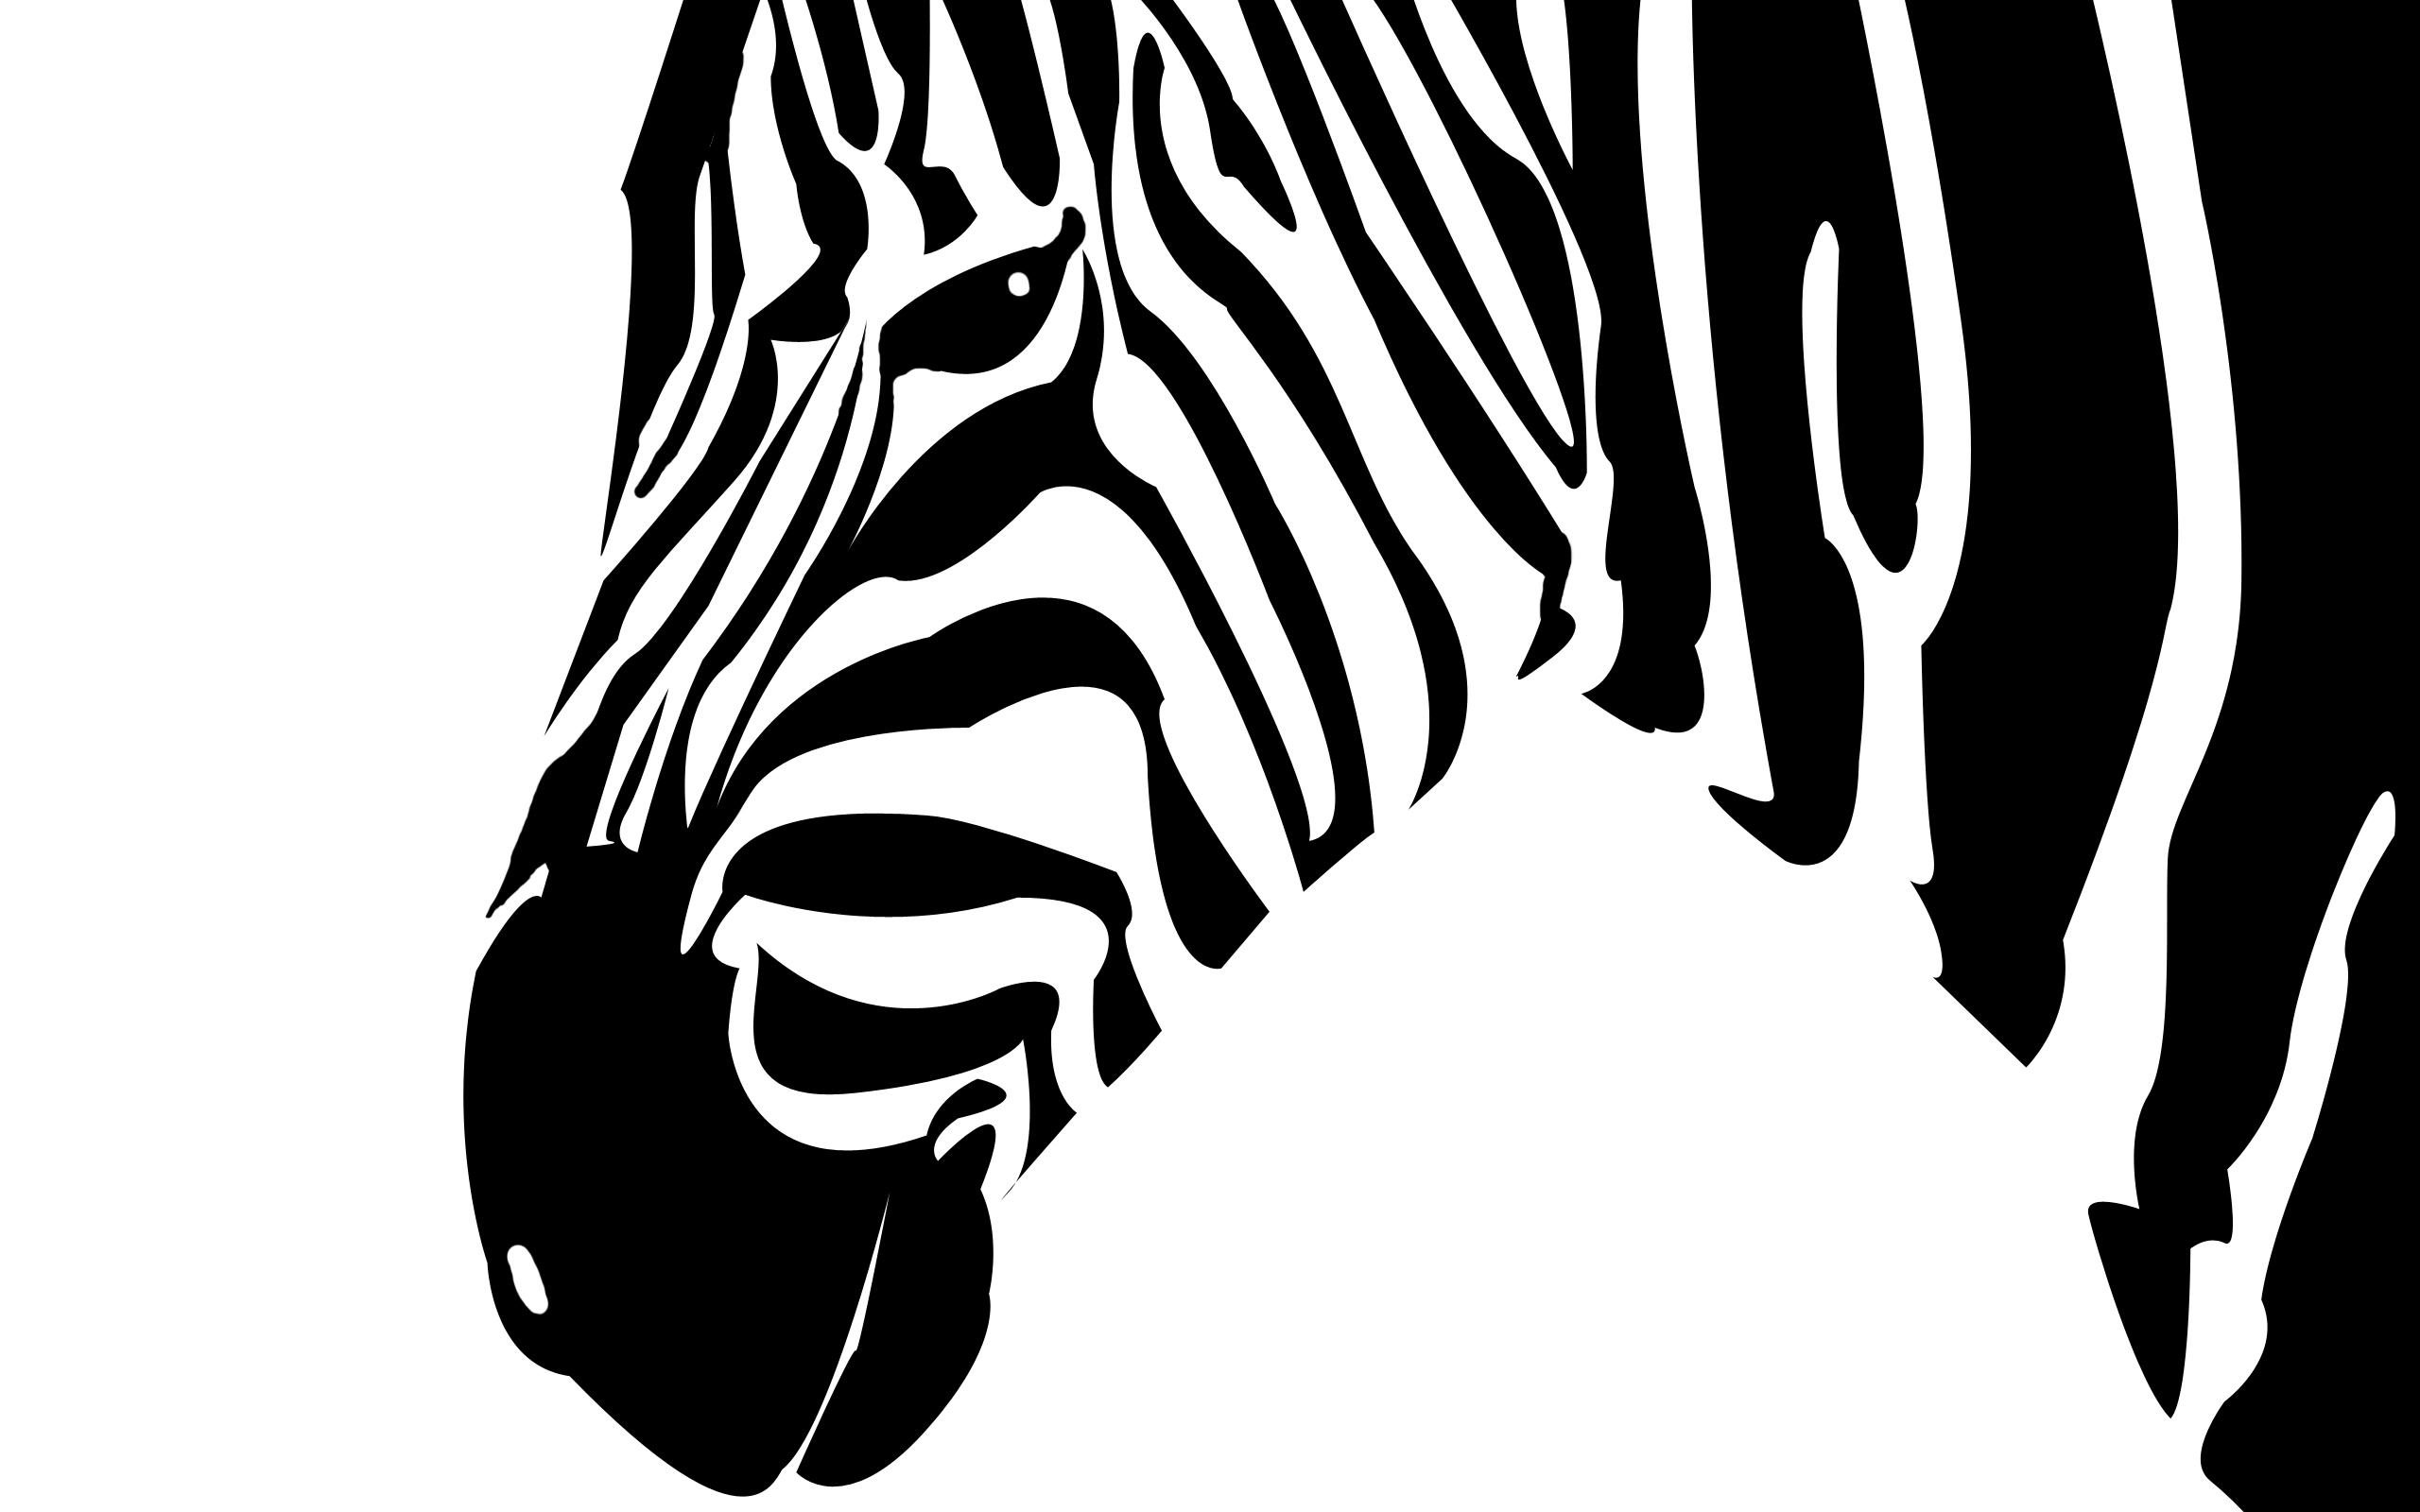 wallpapers/zebra.jpeg